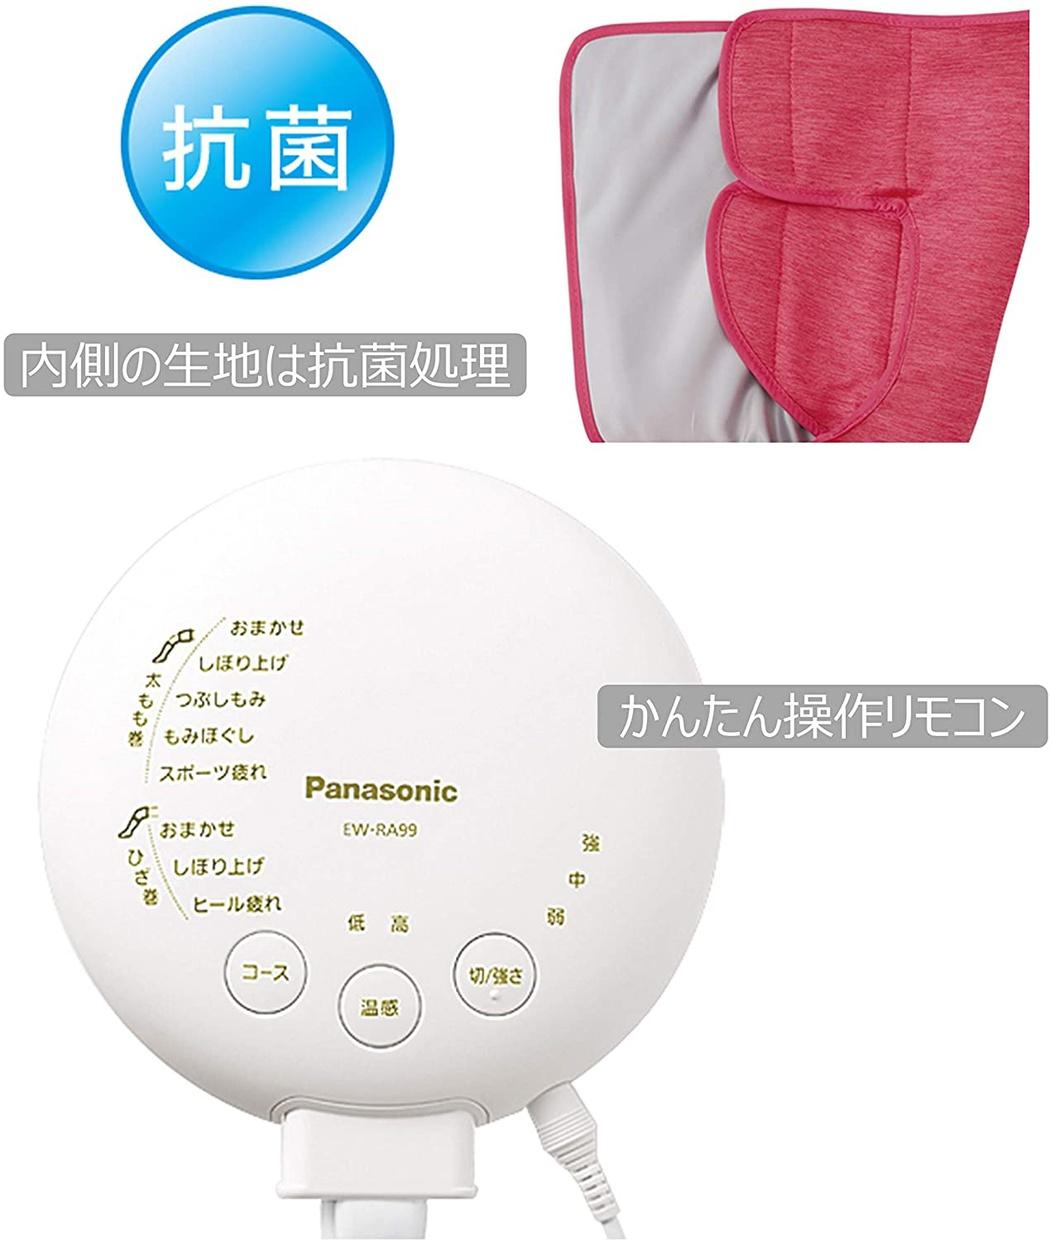 Panasonic(パナソニック) エアーマッサージャー レッグリフレ EW-RA99の商品画像6